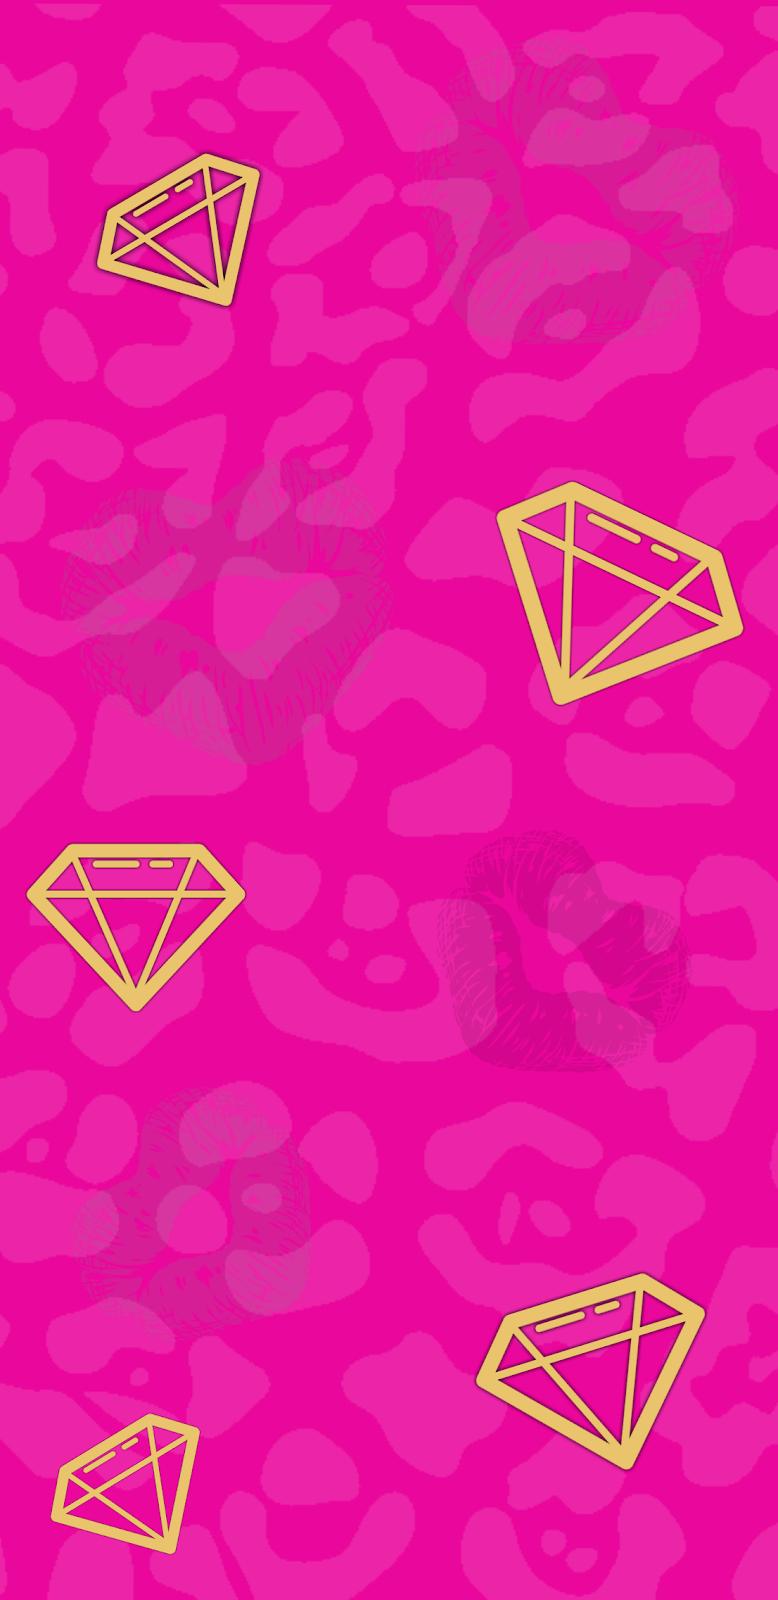 Pink diamond wallpaper by 𝑀𝒾𝒸𝒽𝑒𝓁𝓁𝑒 on ️∂ιαмσи∂ѕ ️